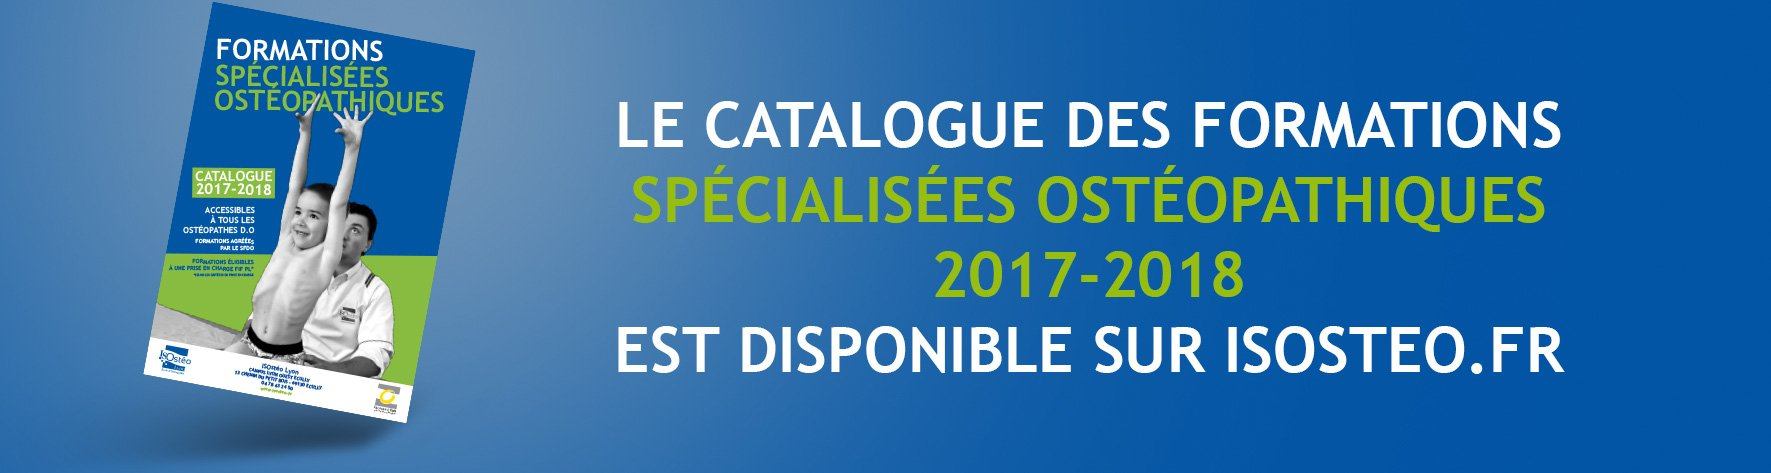 bandeau-catalogue-2017